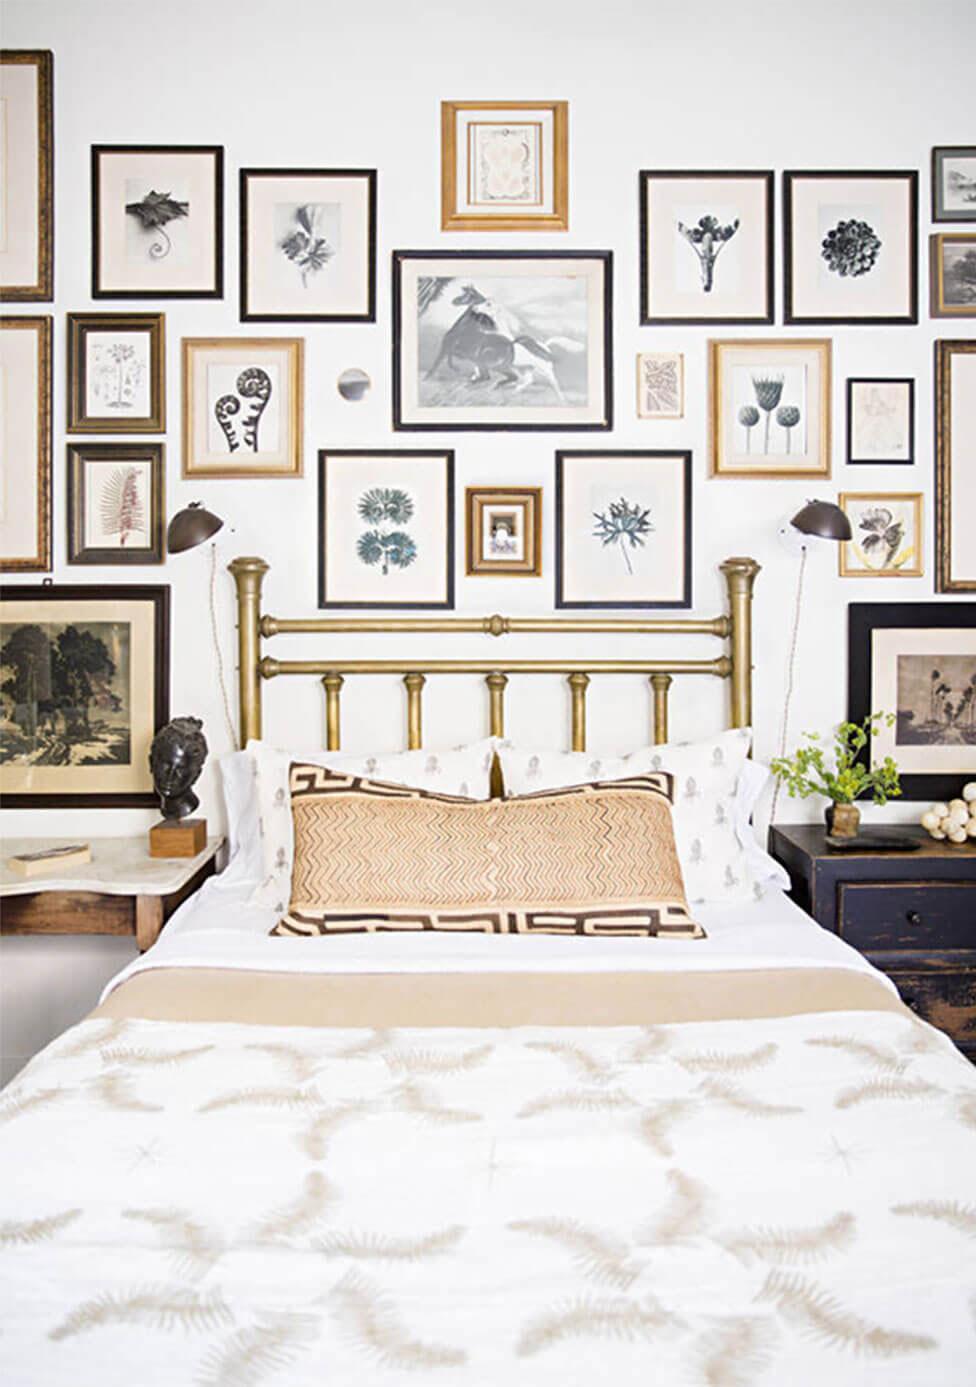 Gallery wall of framed artwork on a bedroom wall.